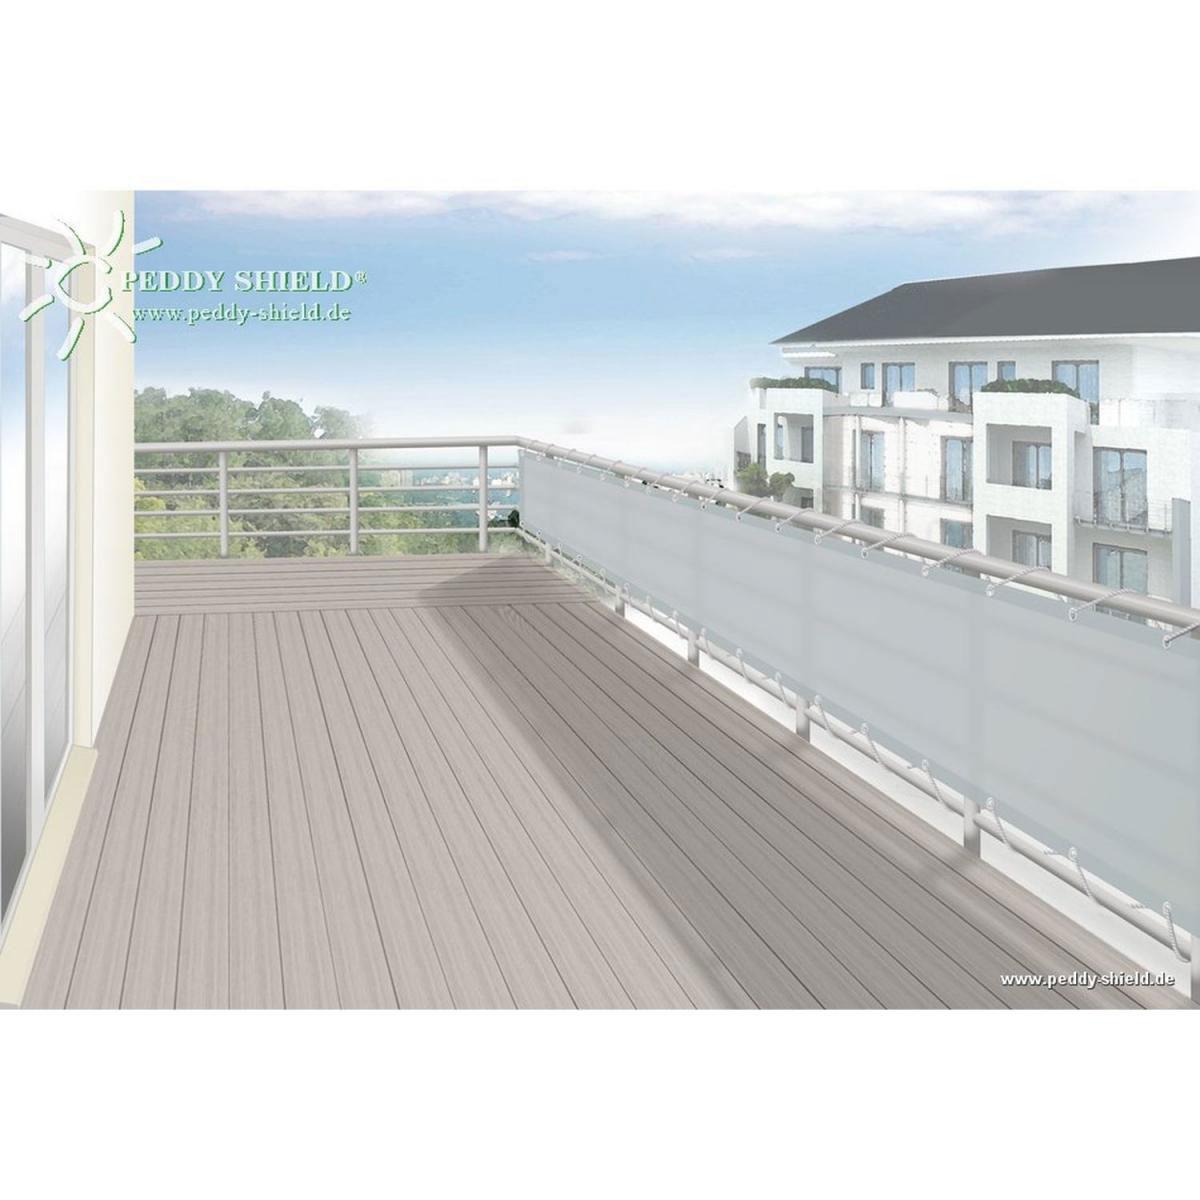 Balkonverkleidung Online Baumarkt Xxl